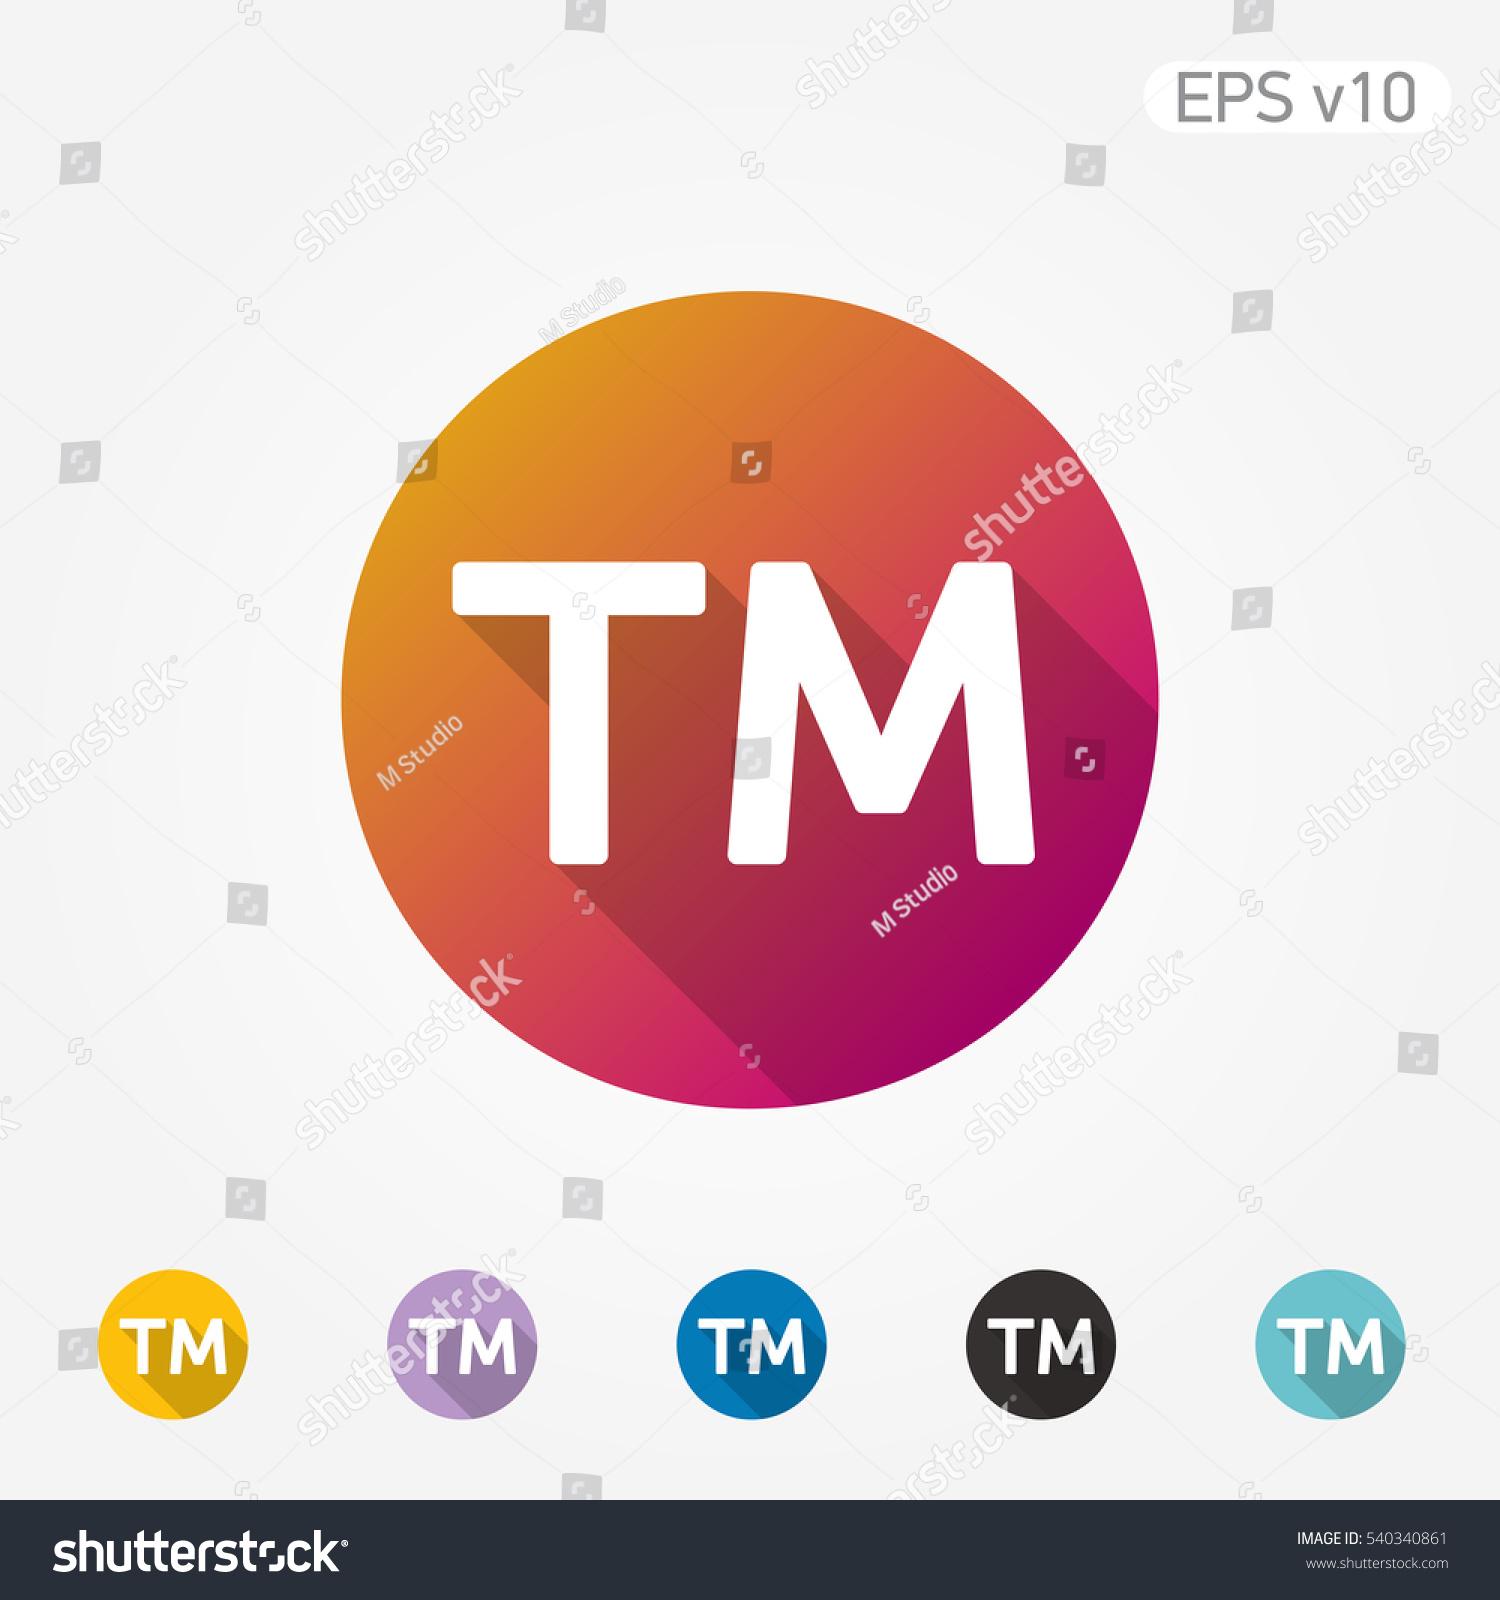 Colored icon trademark symbol shadow stock vector 540340861 colored icon of trademark symbol with shadow buycottarizona